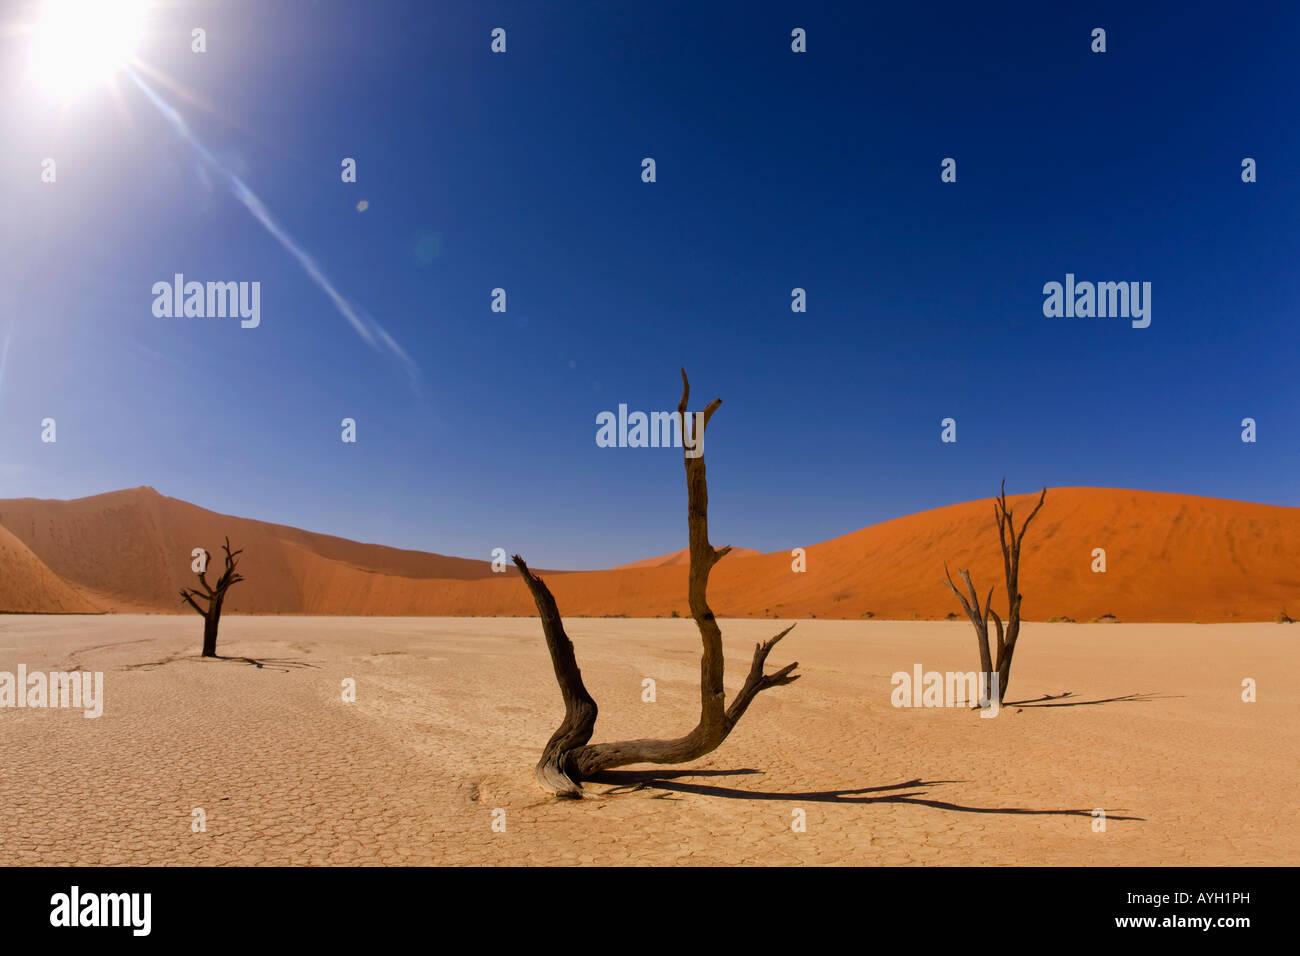 Gli alberi morti, Namib Desert, Namibia, Africa Immagini Stock